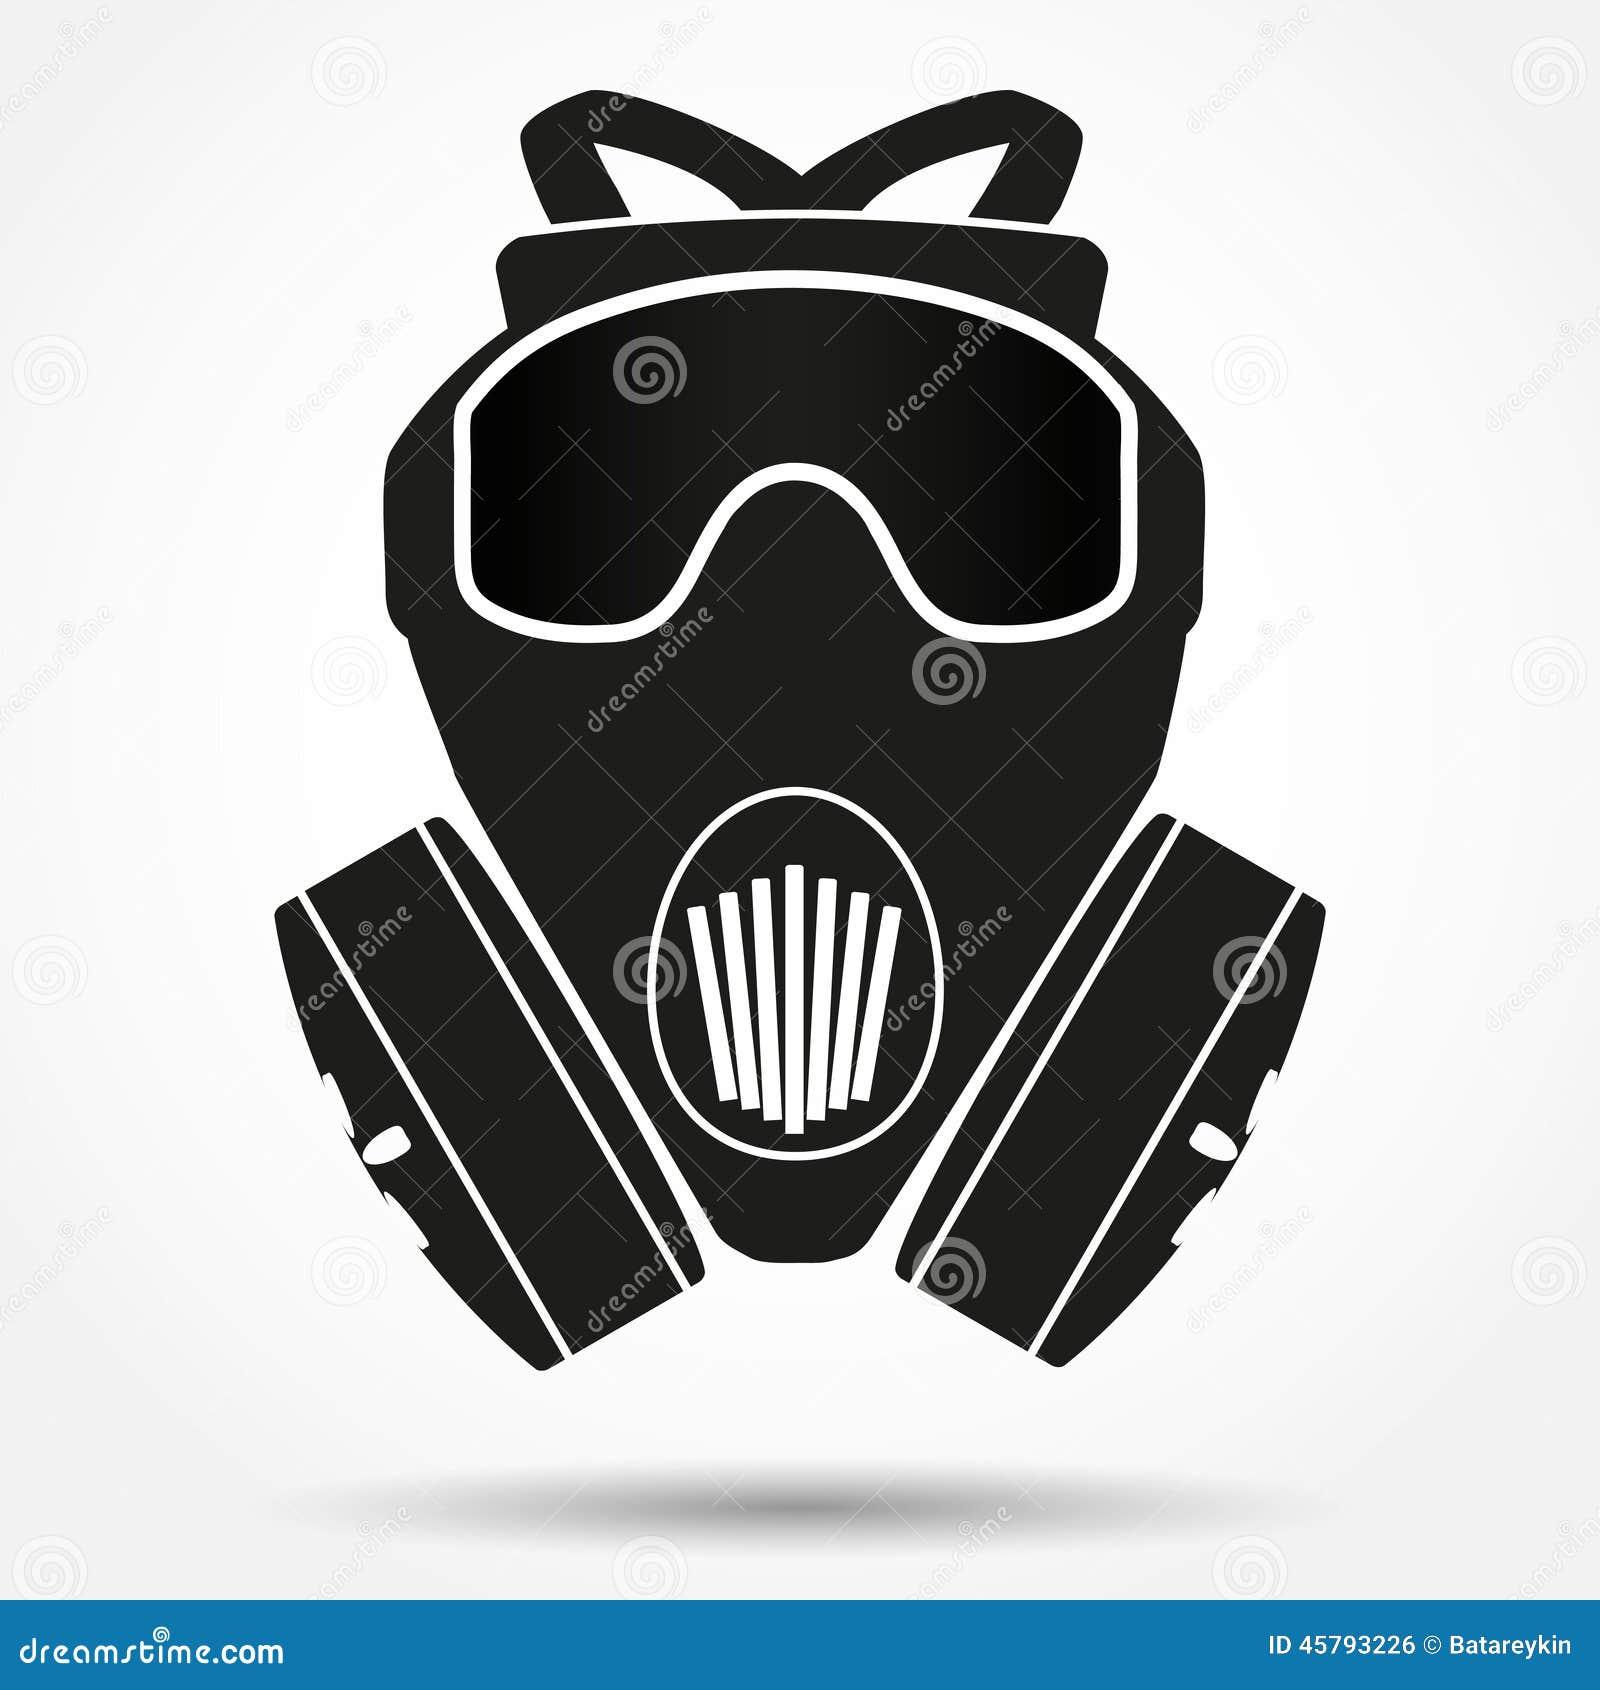 Silhouette symbol of Khaki gas mask respirator  Vector Illustration    Gas Mask Silhouette Vector